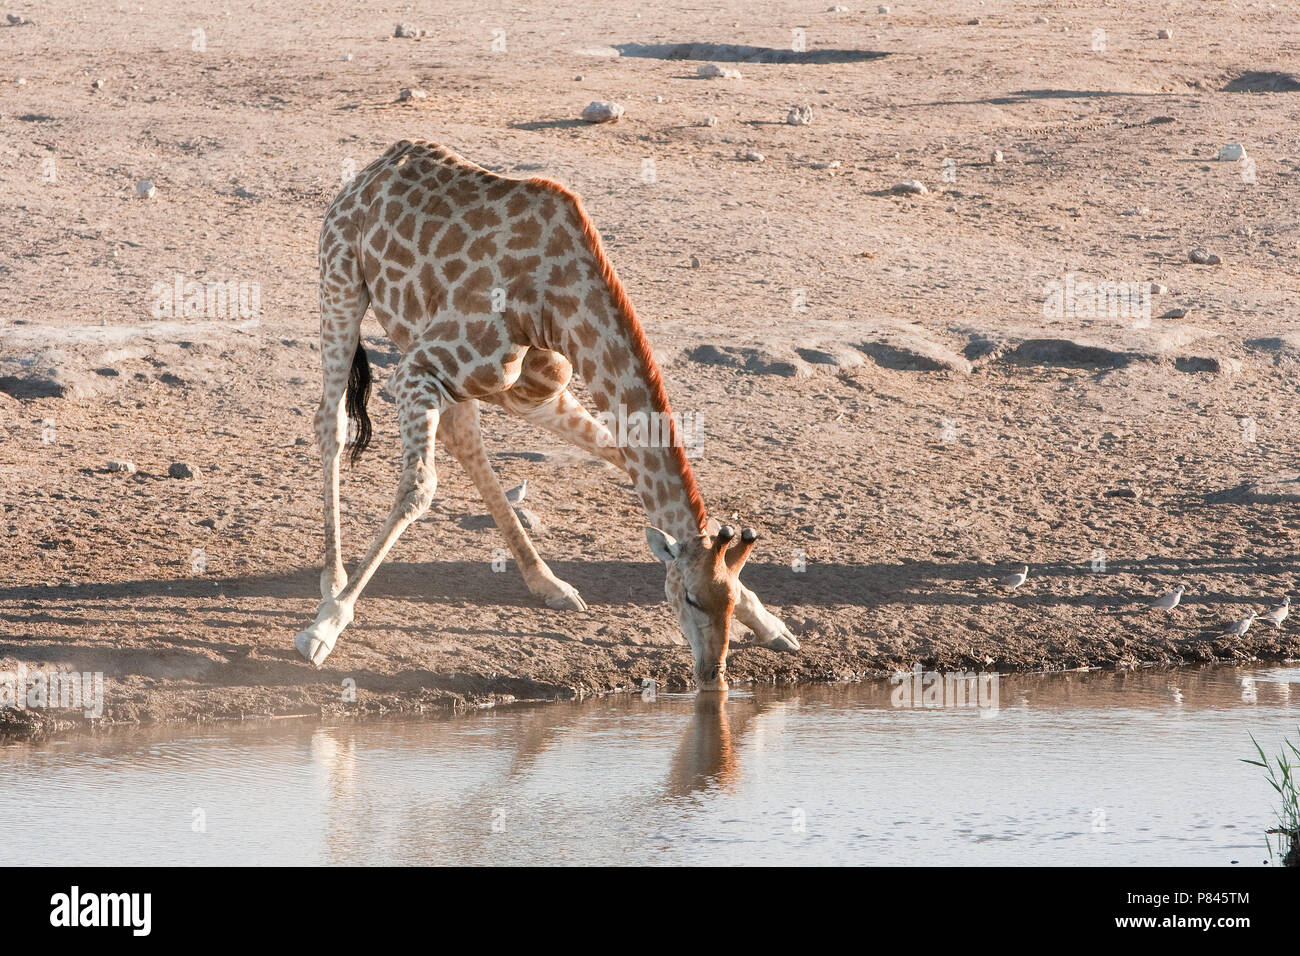 Giraf drinkend Etosha NP Namibie, Giraffe drinking Etosha NP Namibia - Stock Image